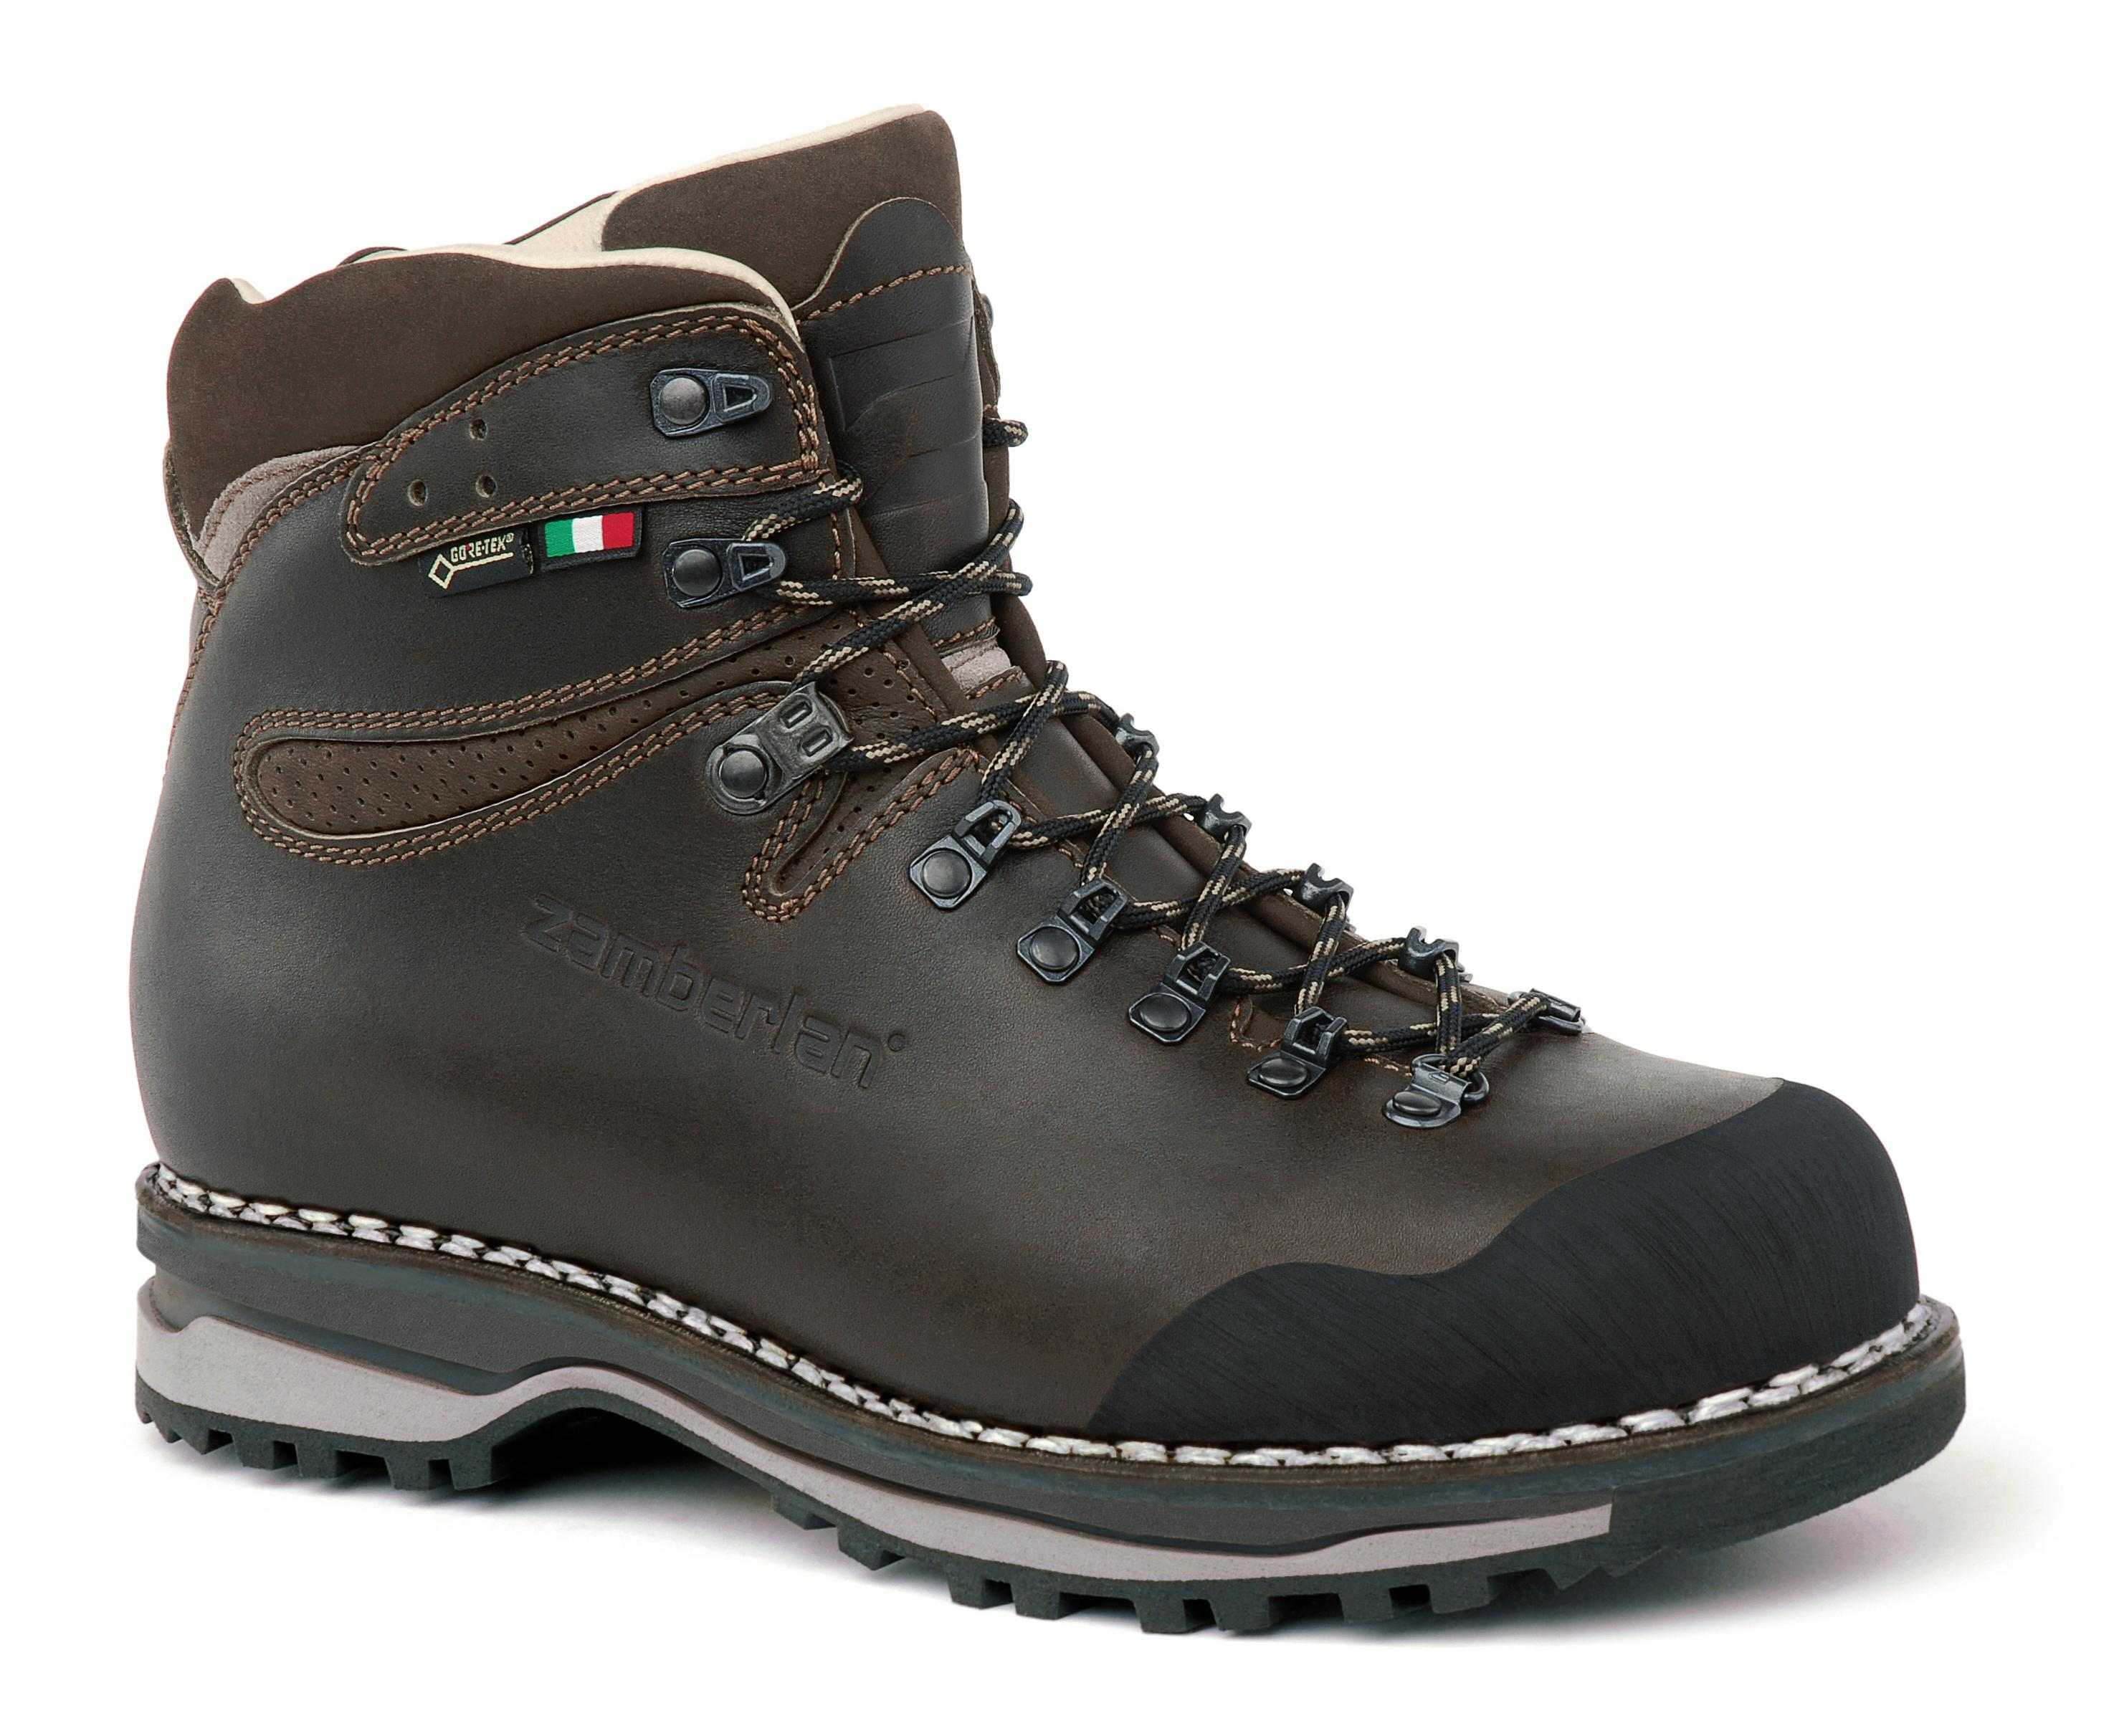 1025 TOFANE NW GTX® RR   -     Trekkingschuhe   -   Waxed Dark Brown